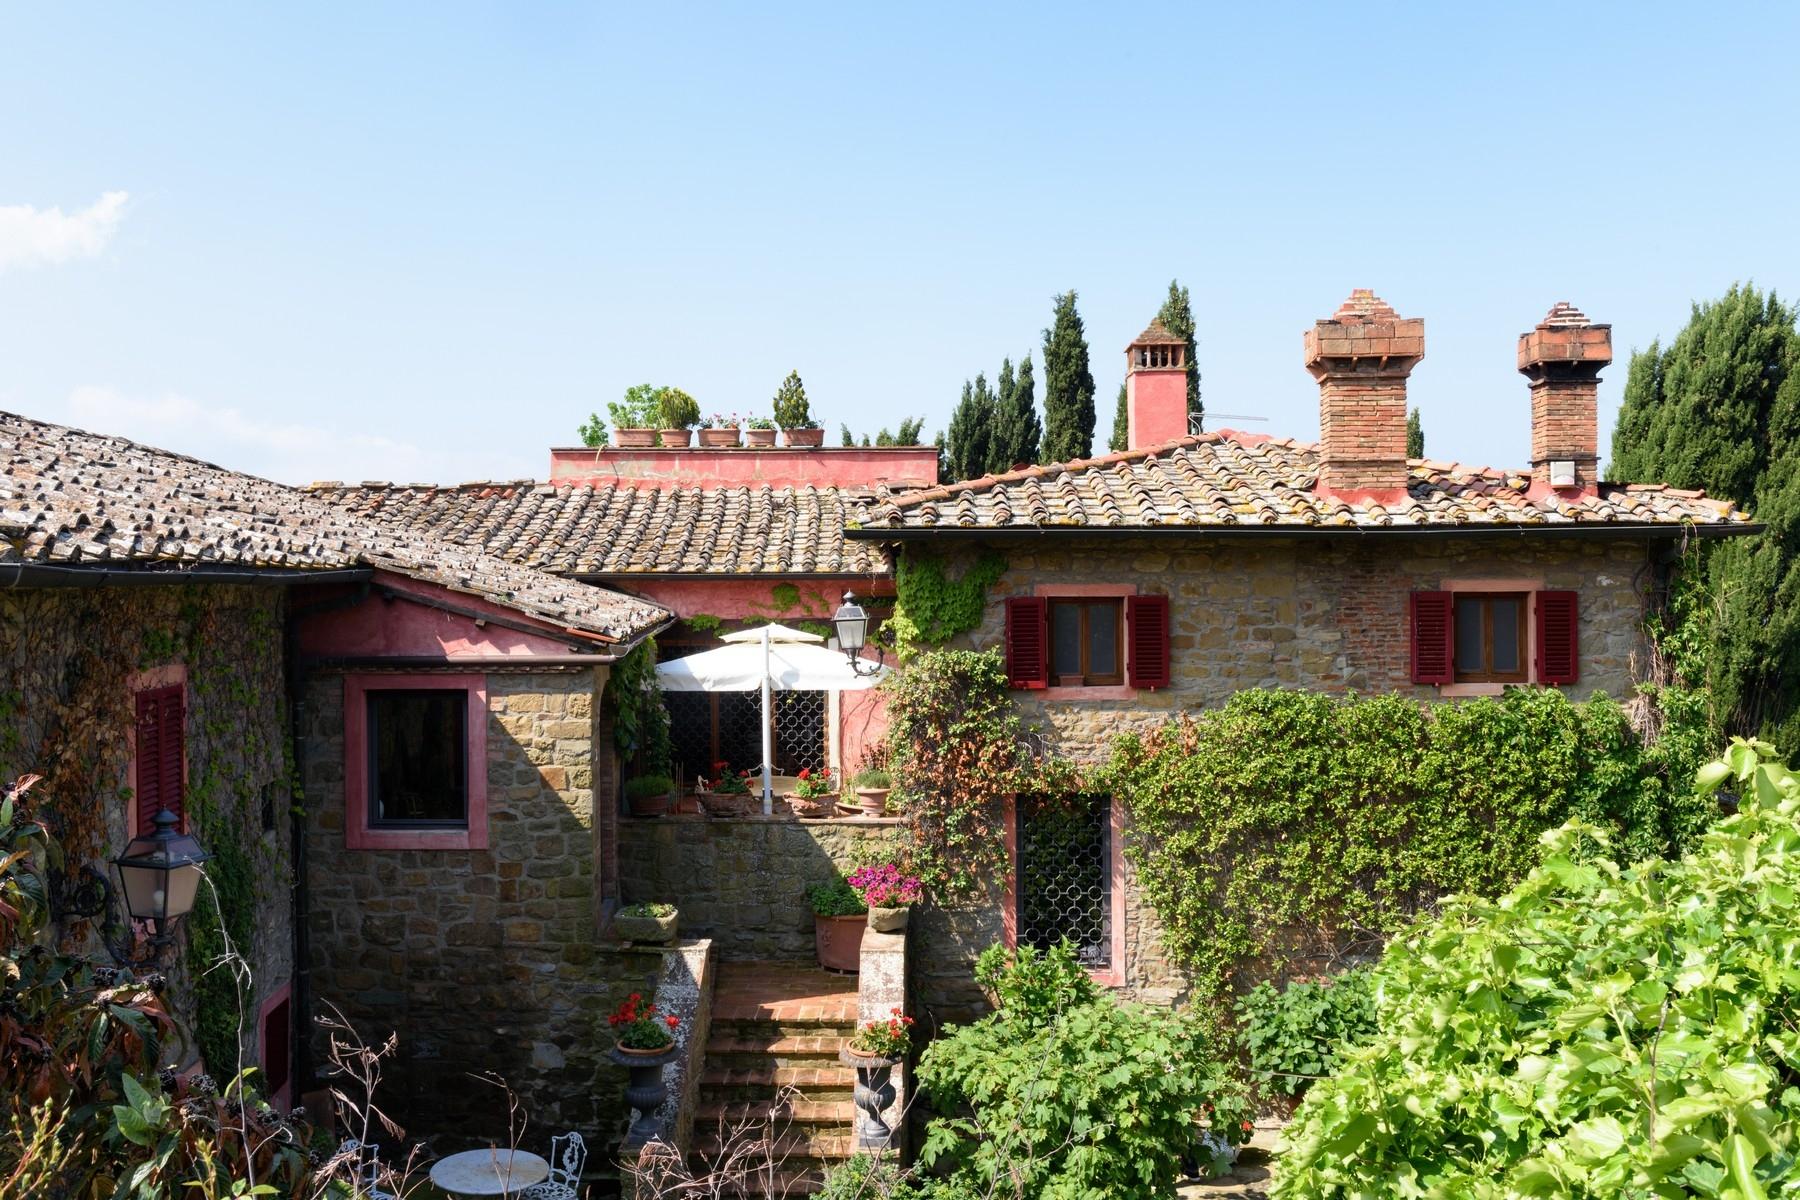 Villa in Vendita a Greve In Chianti: 5 locali, 491 mq - Foto 2